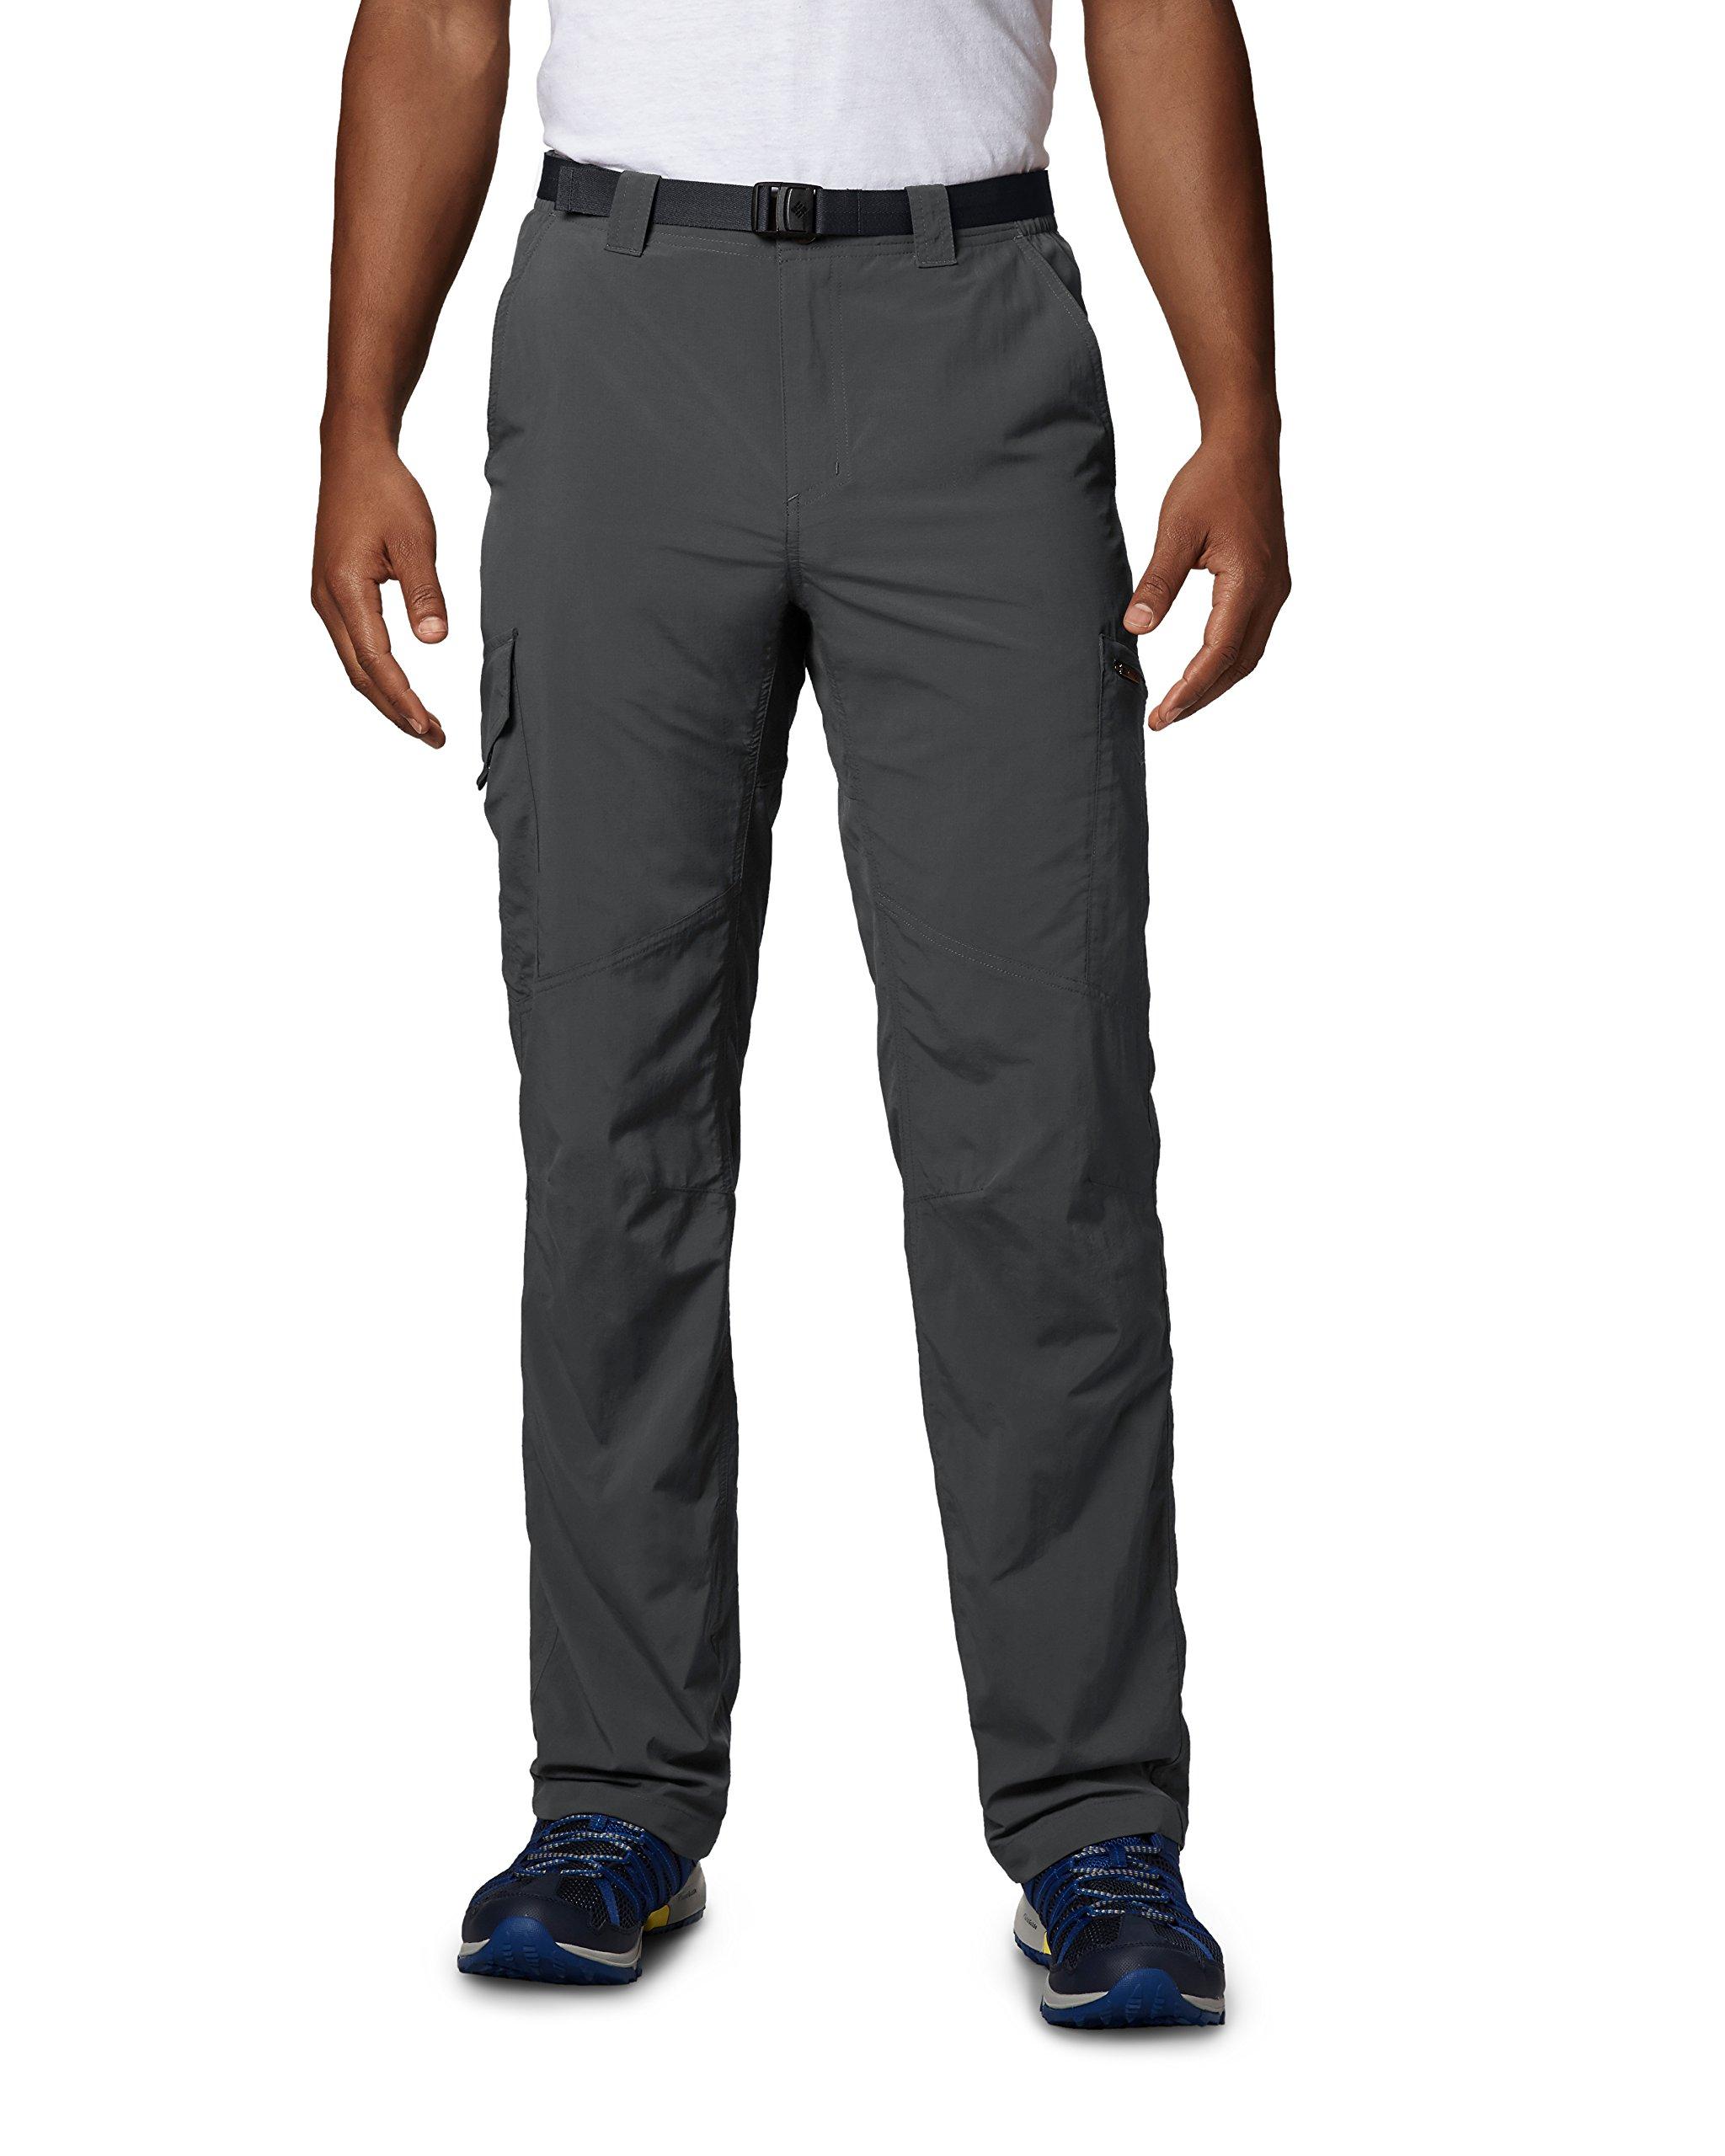 81Q117DwGSL - Columbia Men's Silver Ridge Cargo Pant Silver Ridge Cargo Pant